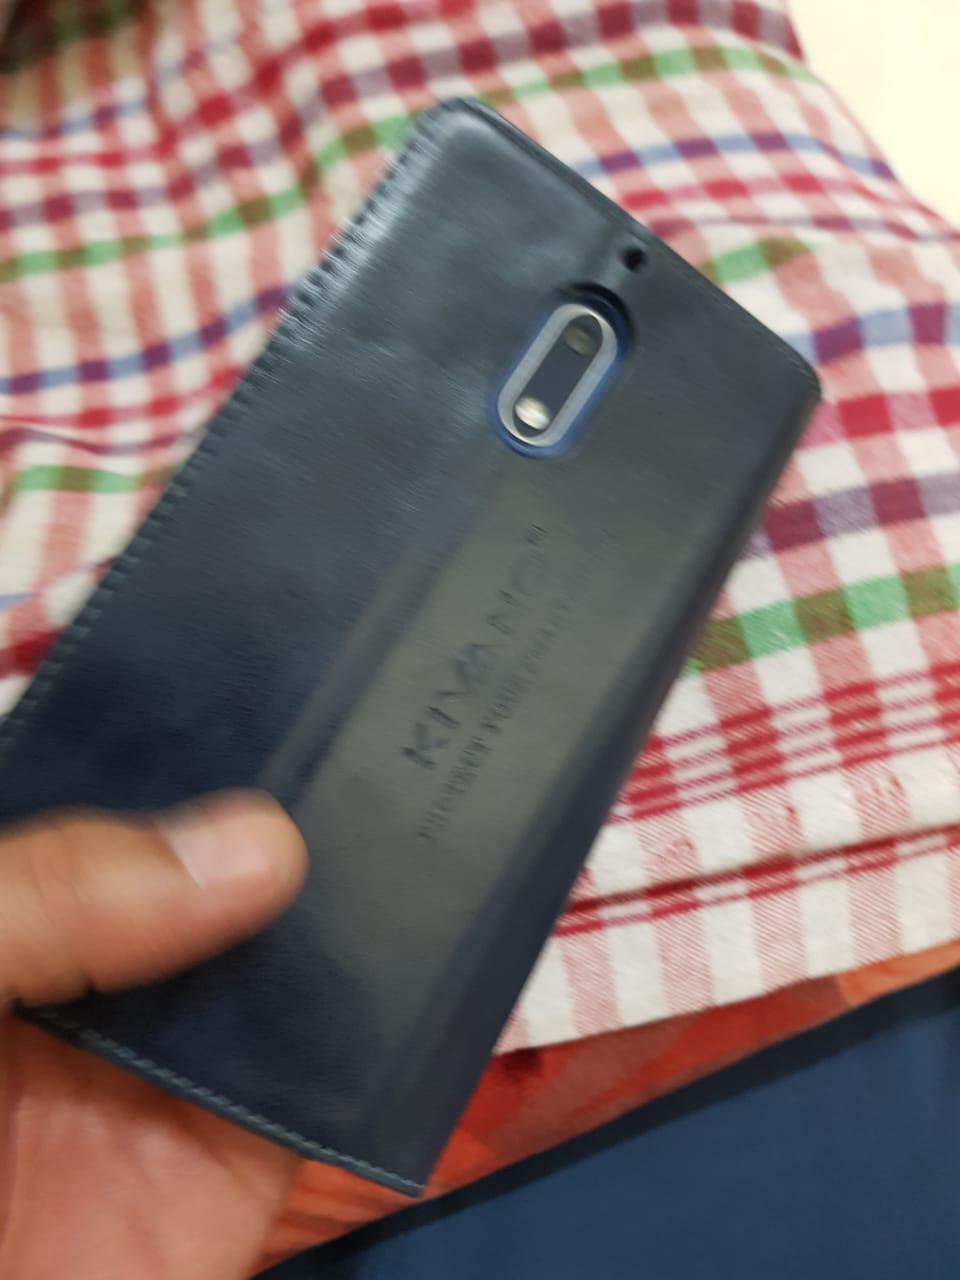 Nokia 6 phone internal storage 32 GB Ram 3 GB